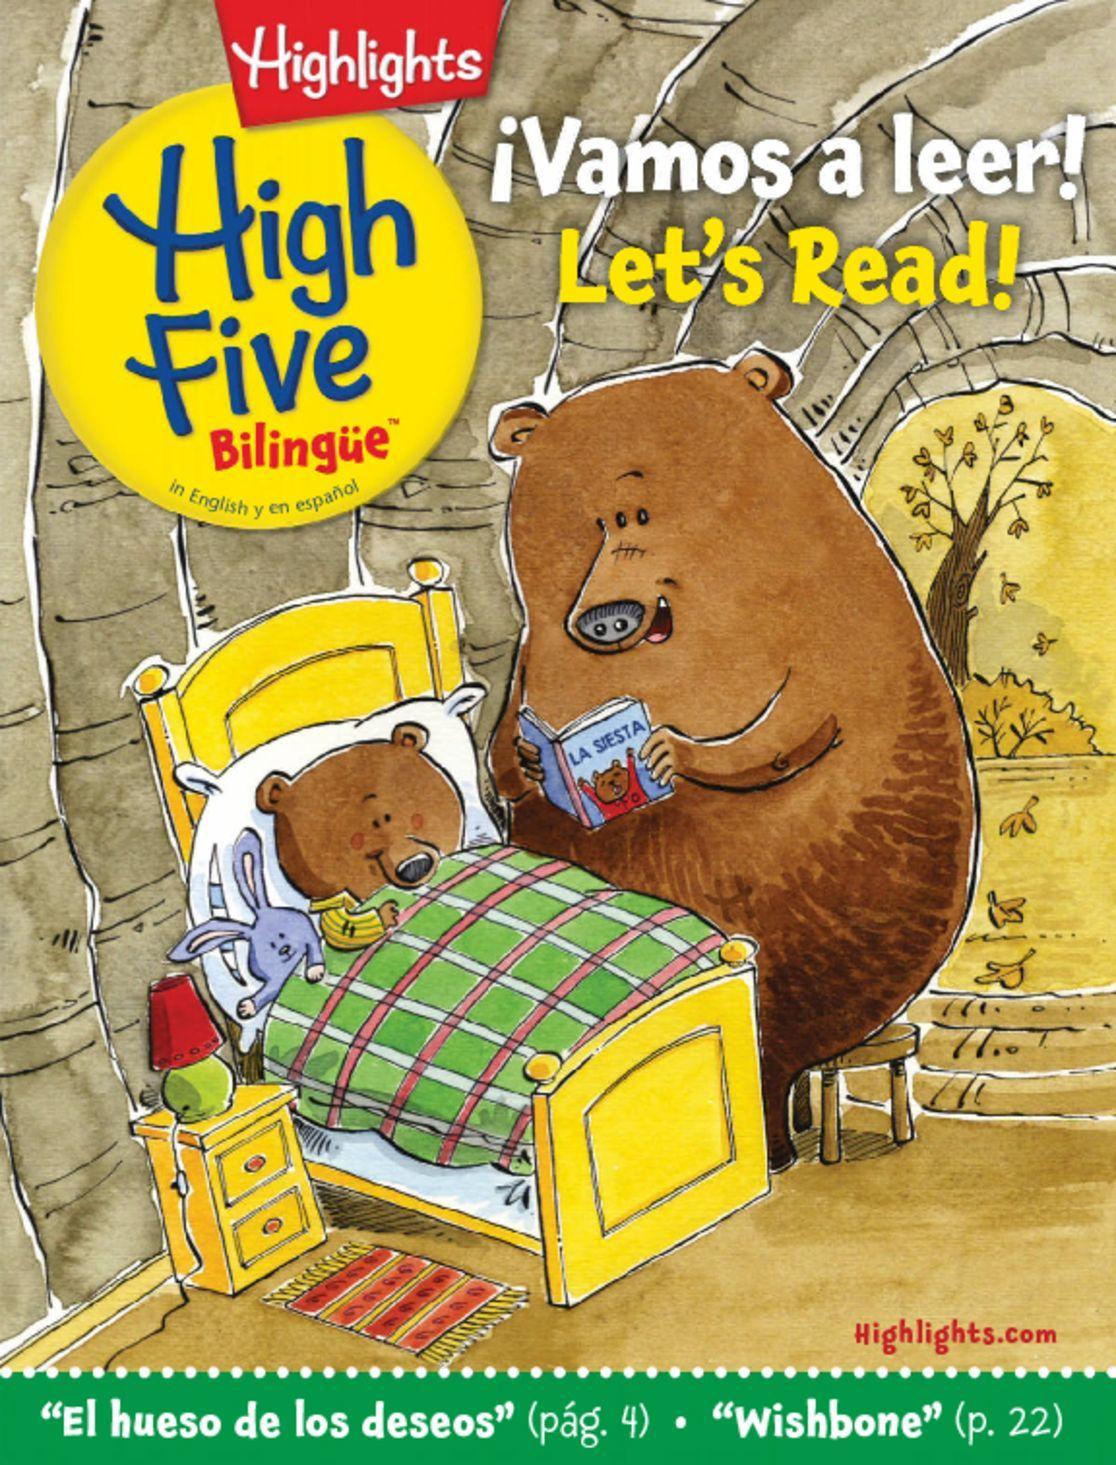 Highlights High Five Bilingue Magazine Subscription